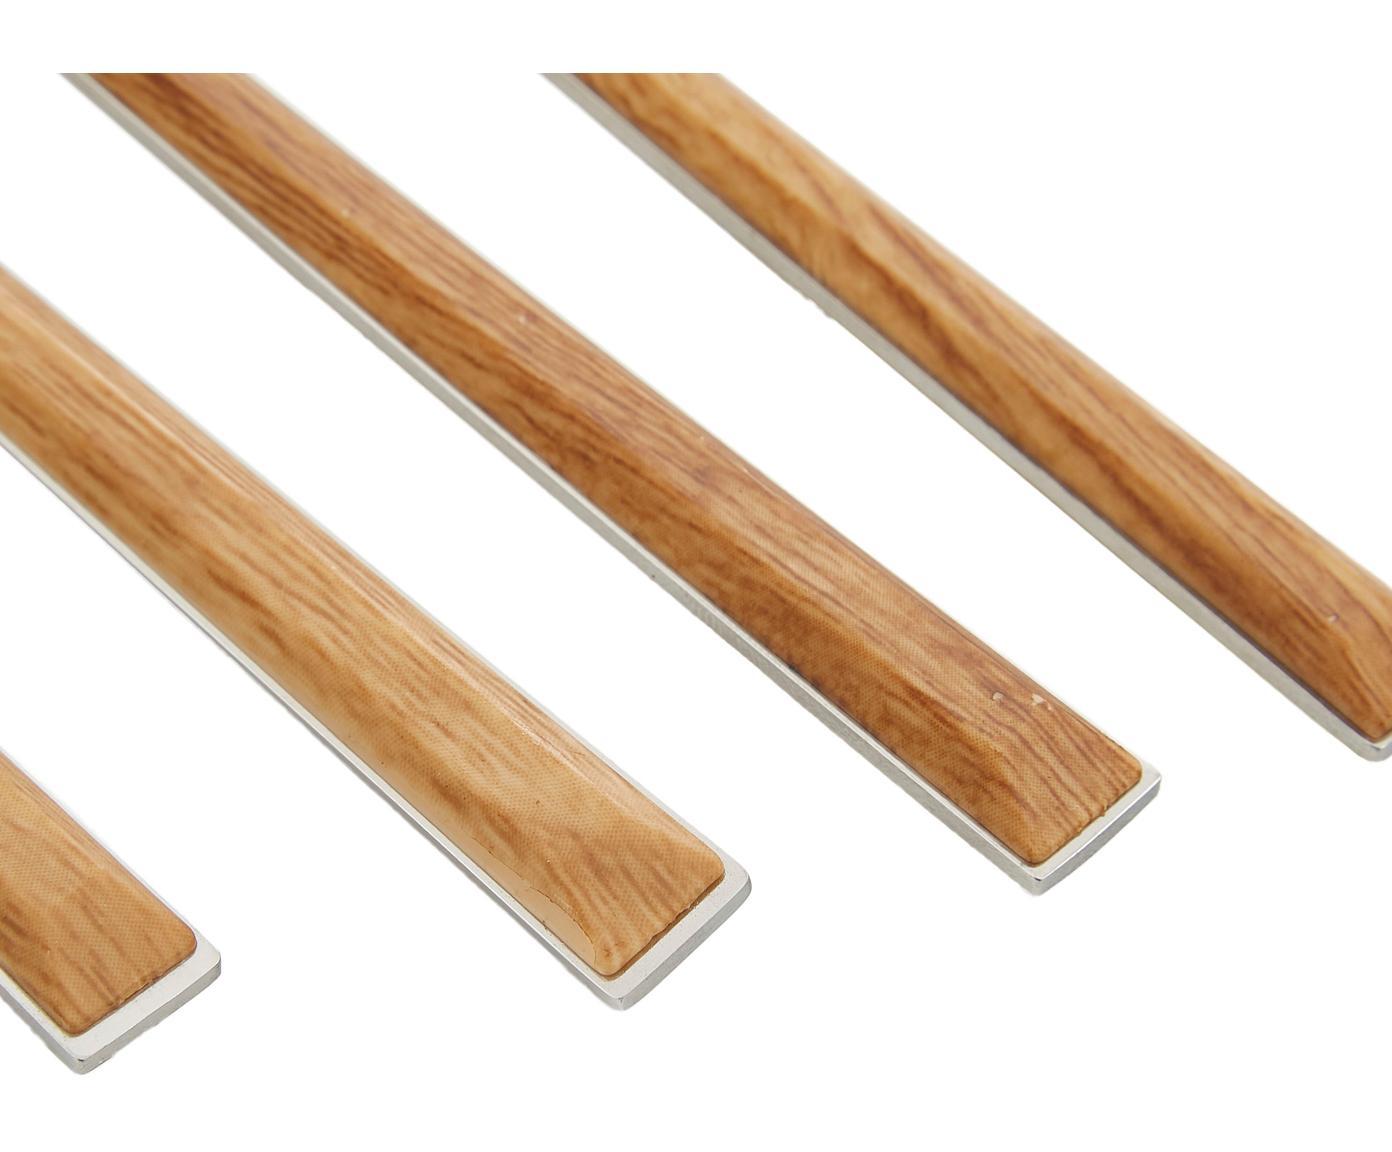 Besteck-Set Wodoley mit Griffen in Holzoptik, 4 Personen (16-tlg.), EdelstahlGriff: Braun, Holz-Optik, L 23 cm